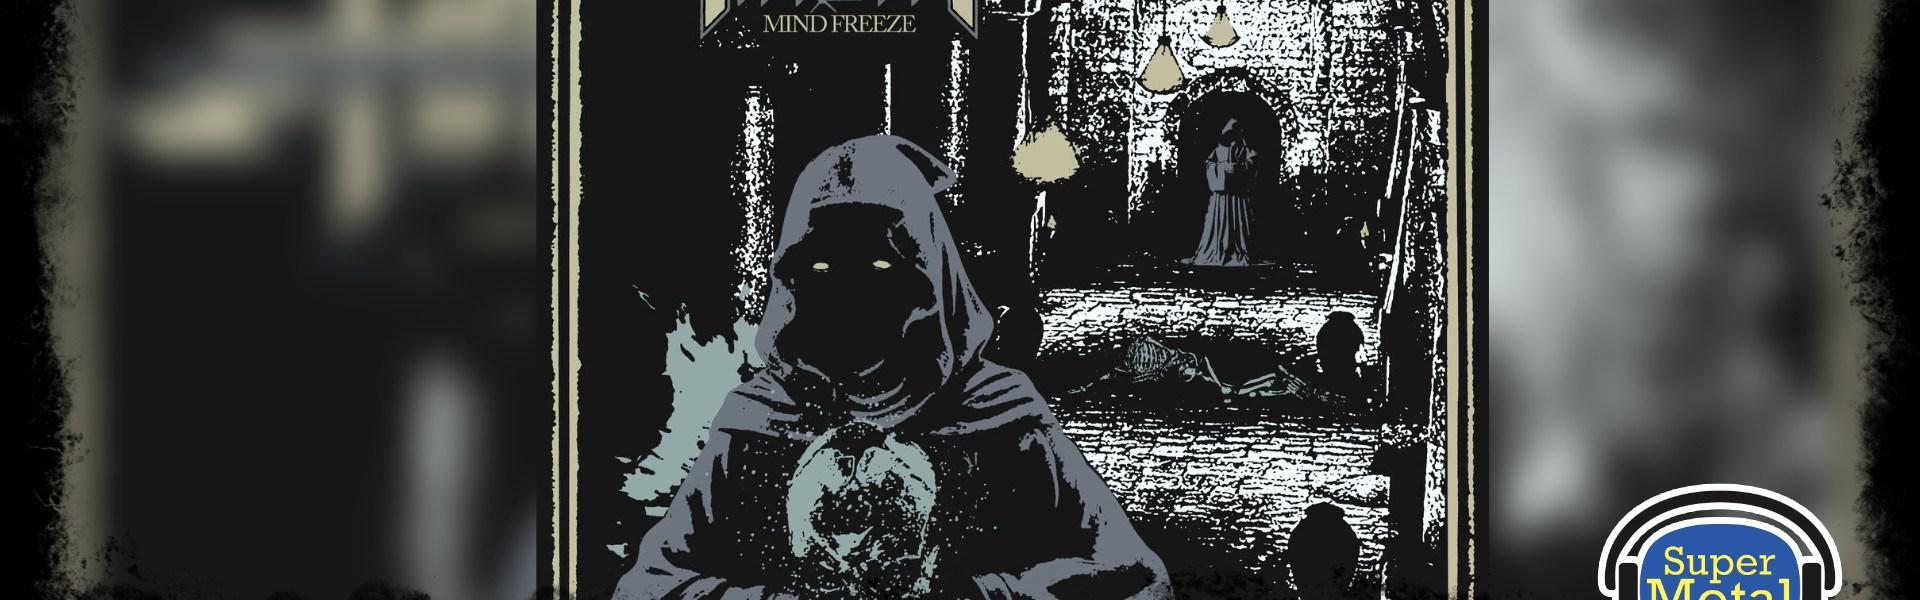 Mind Freeze album art